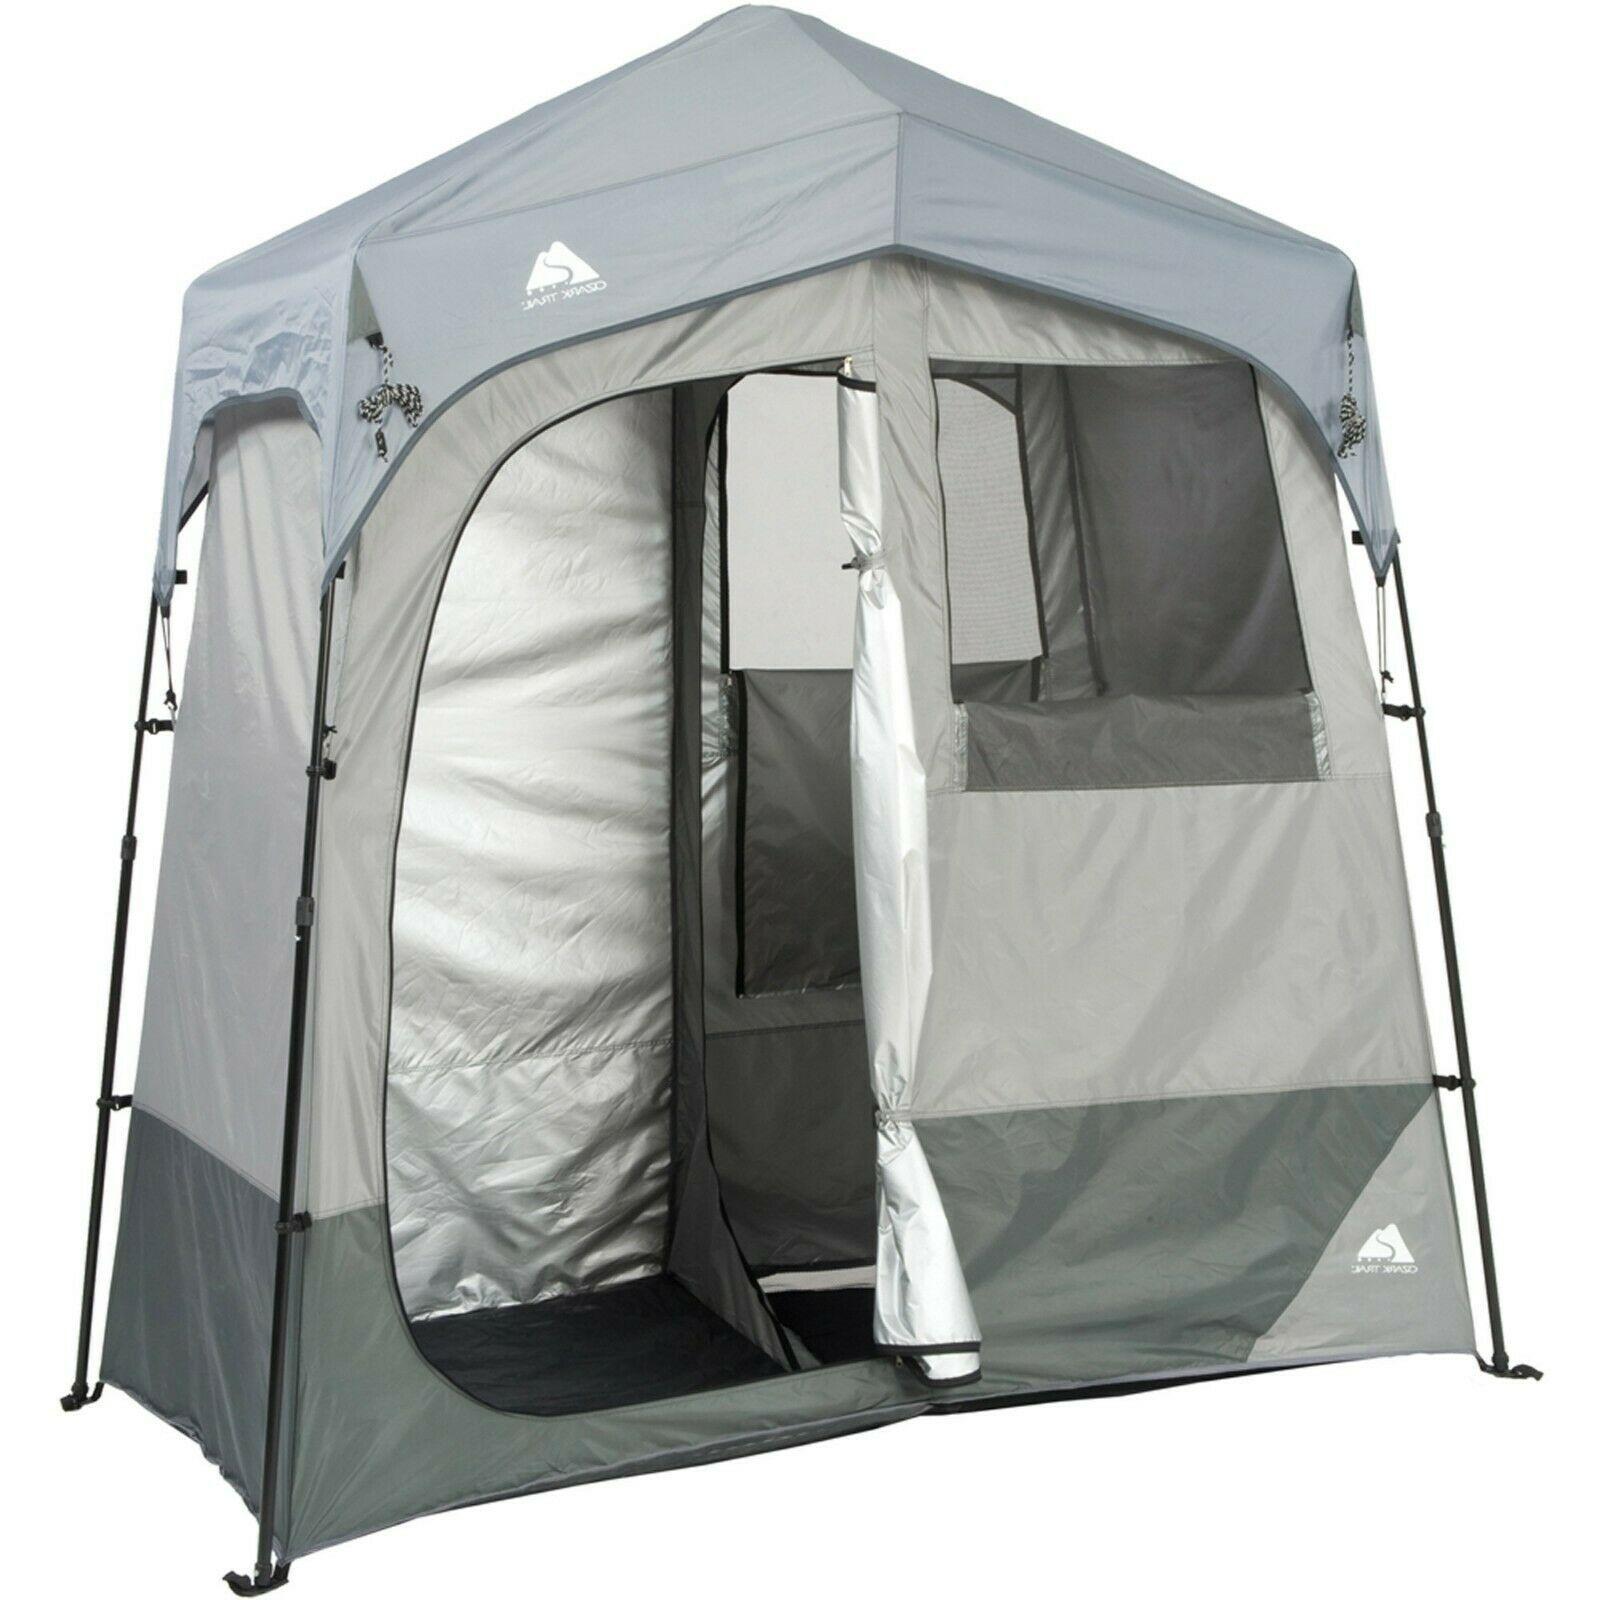 Ozark Trail Tent: 42 listings